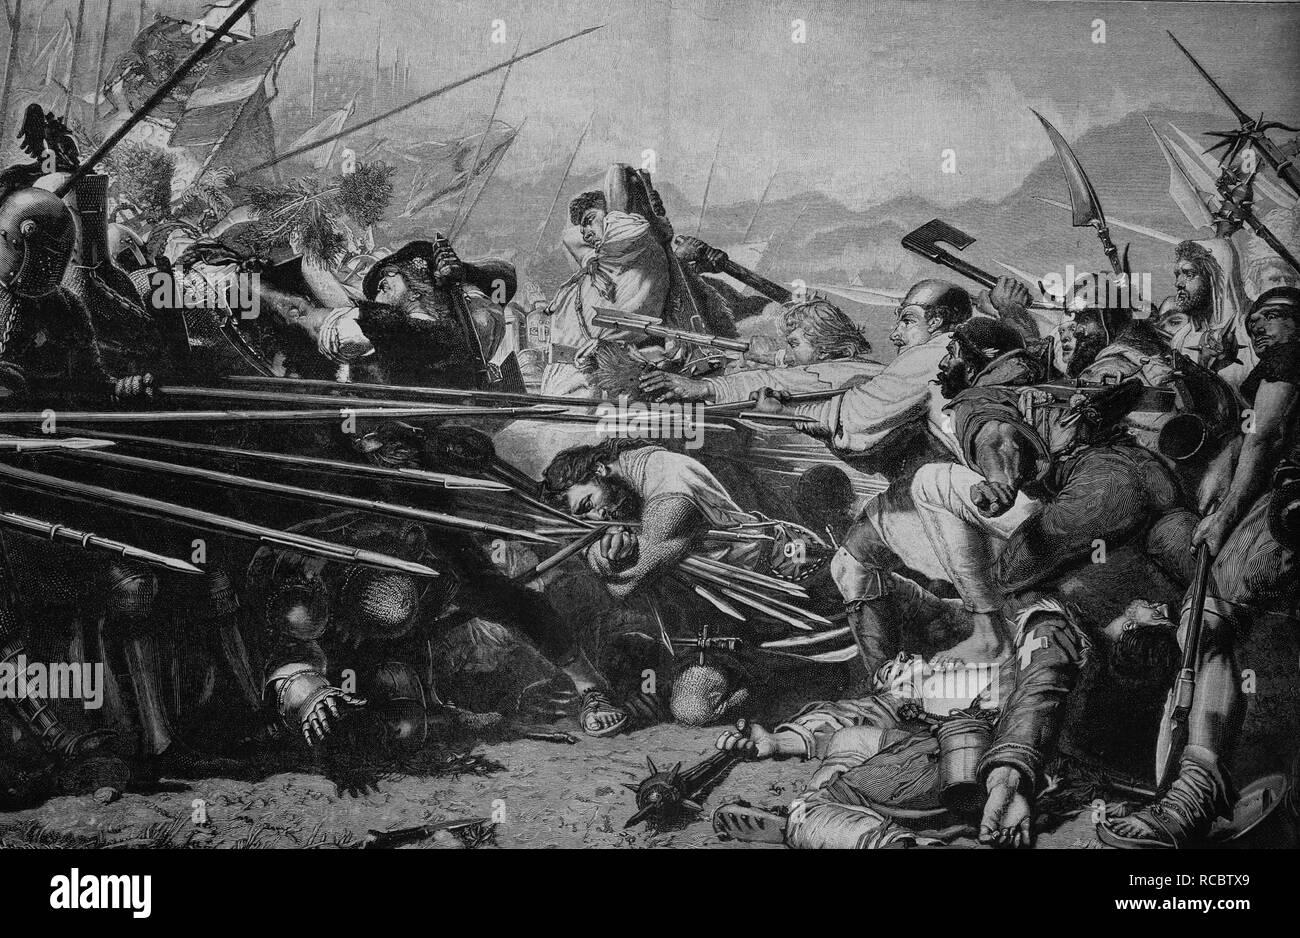 Arnold Winkelried or Arnold von Winkelried, 1386, at the Battle of Sempach, Switzerland, historical engraving, circa 1885 Stock Photo